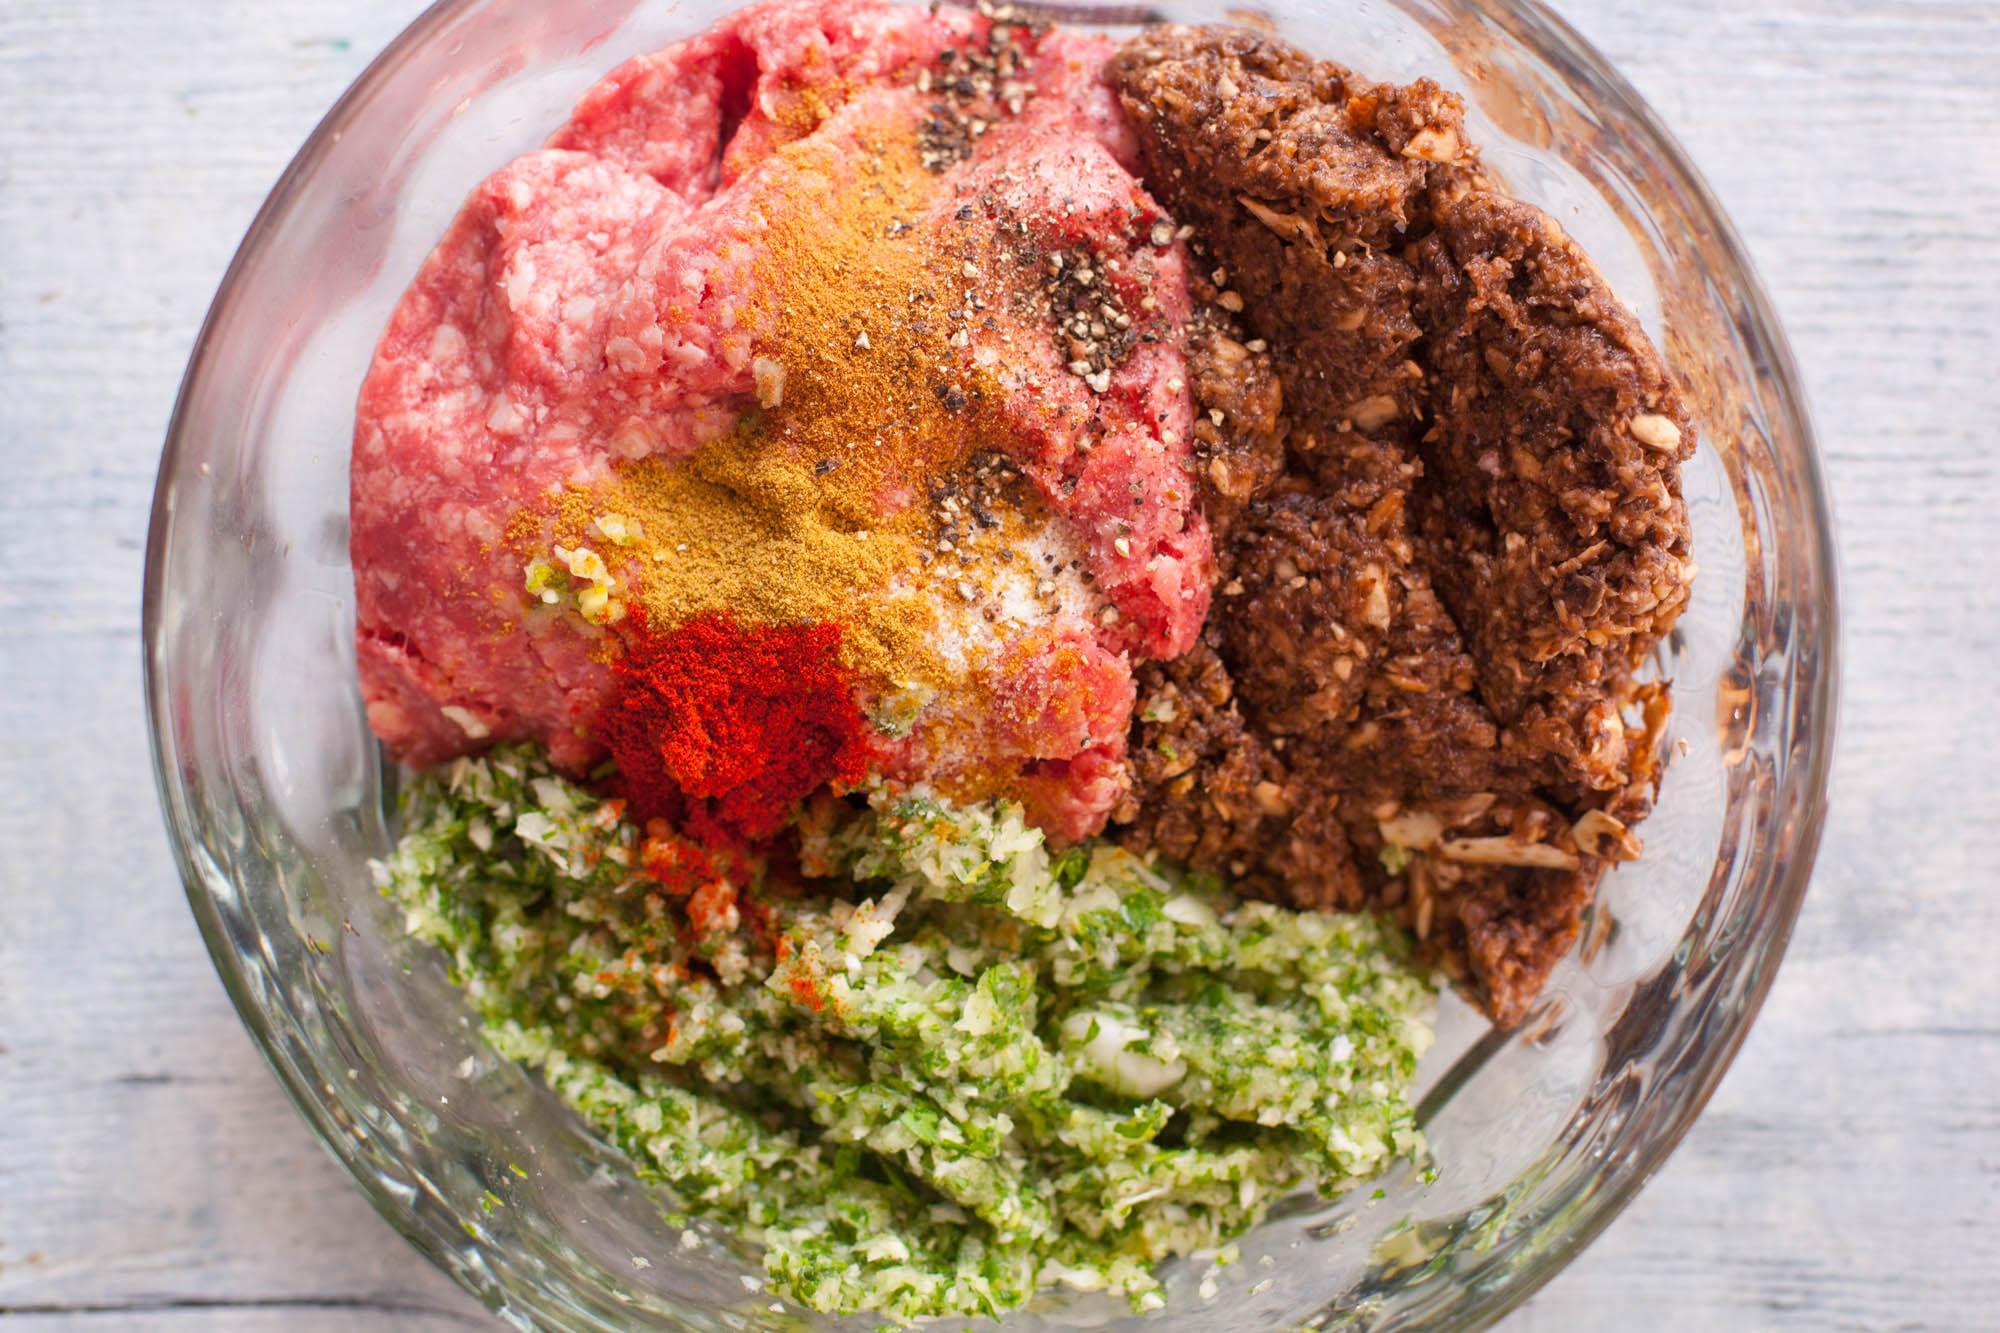 ground lamb kofta ingredients in bowl